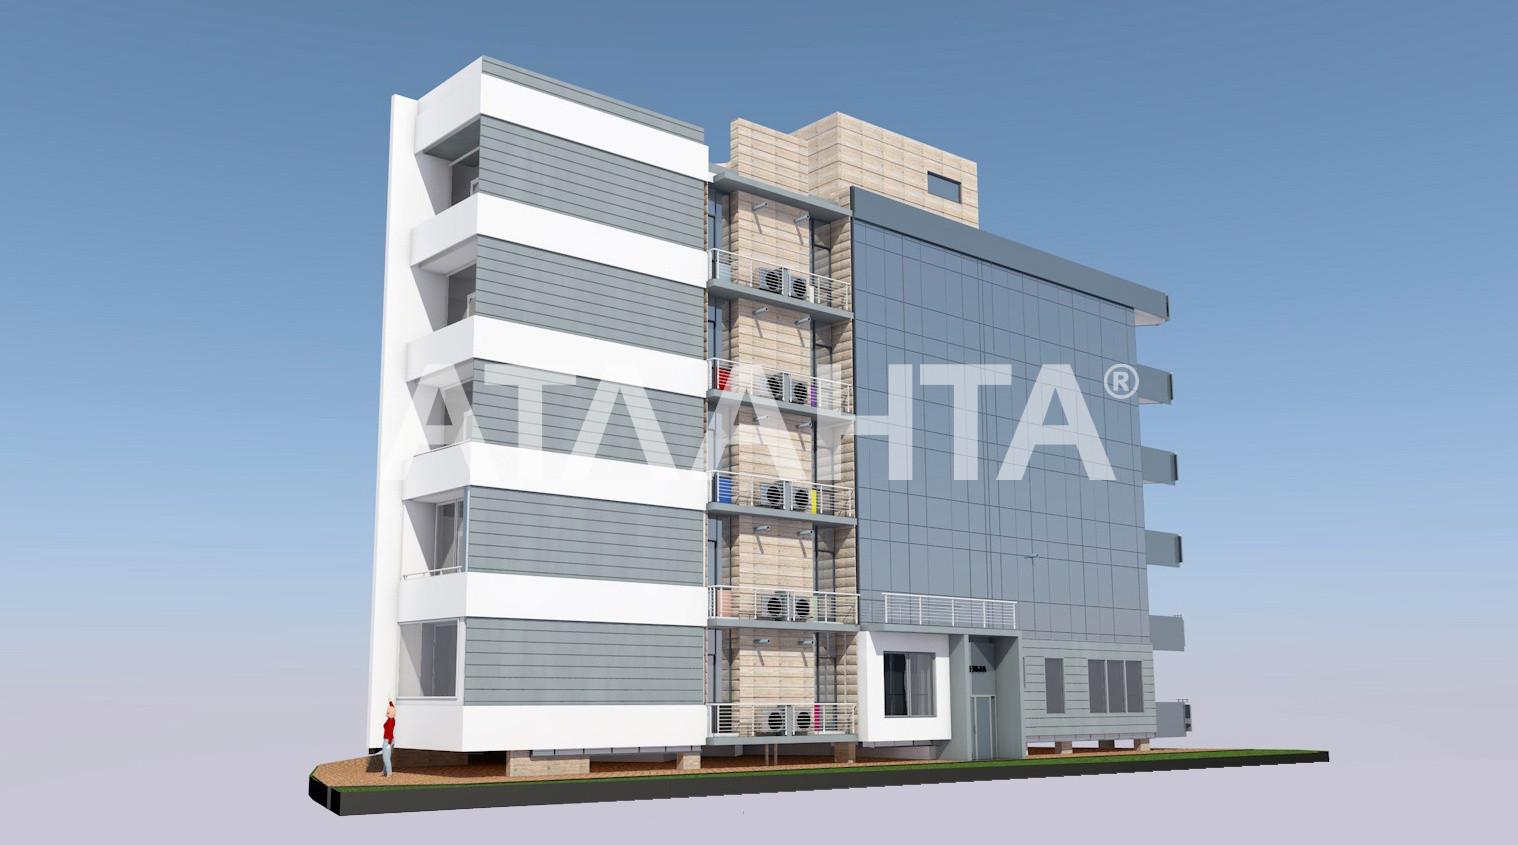 Продается 1-комнатная Квартира на ул. Леваневского — 30 328 у.е.